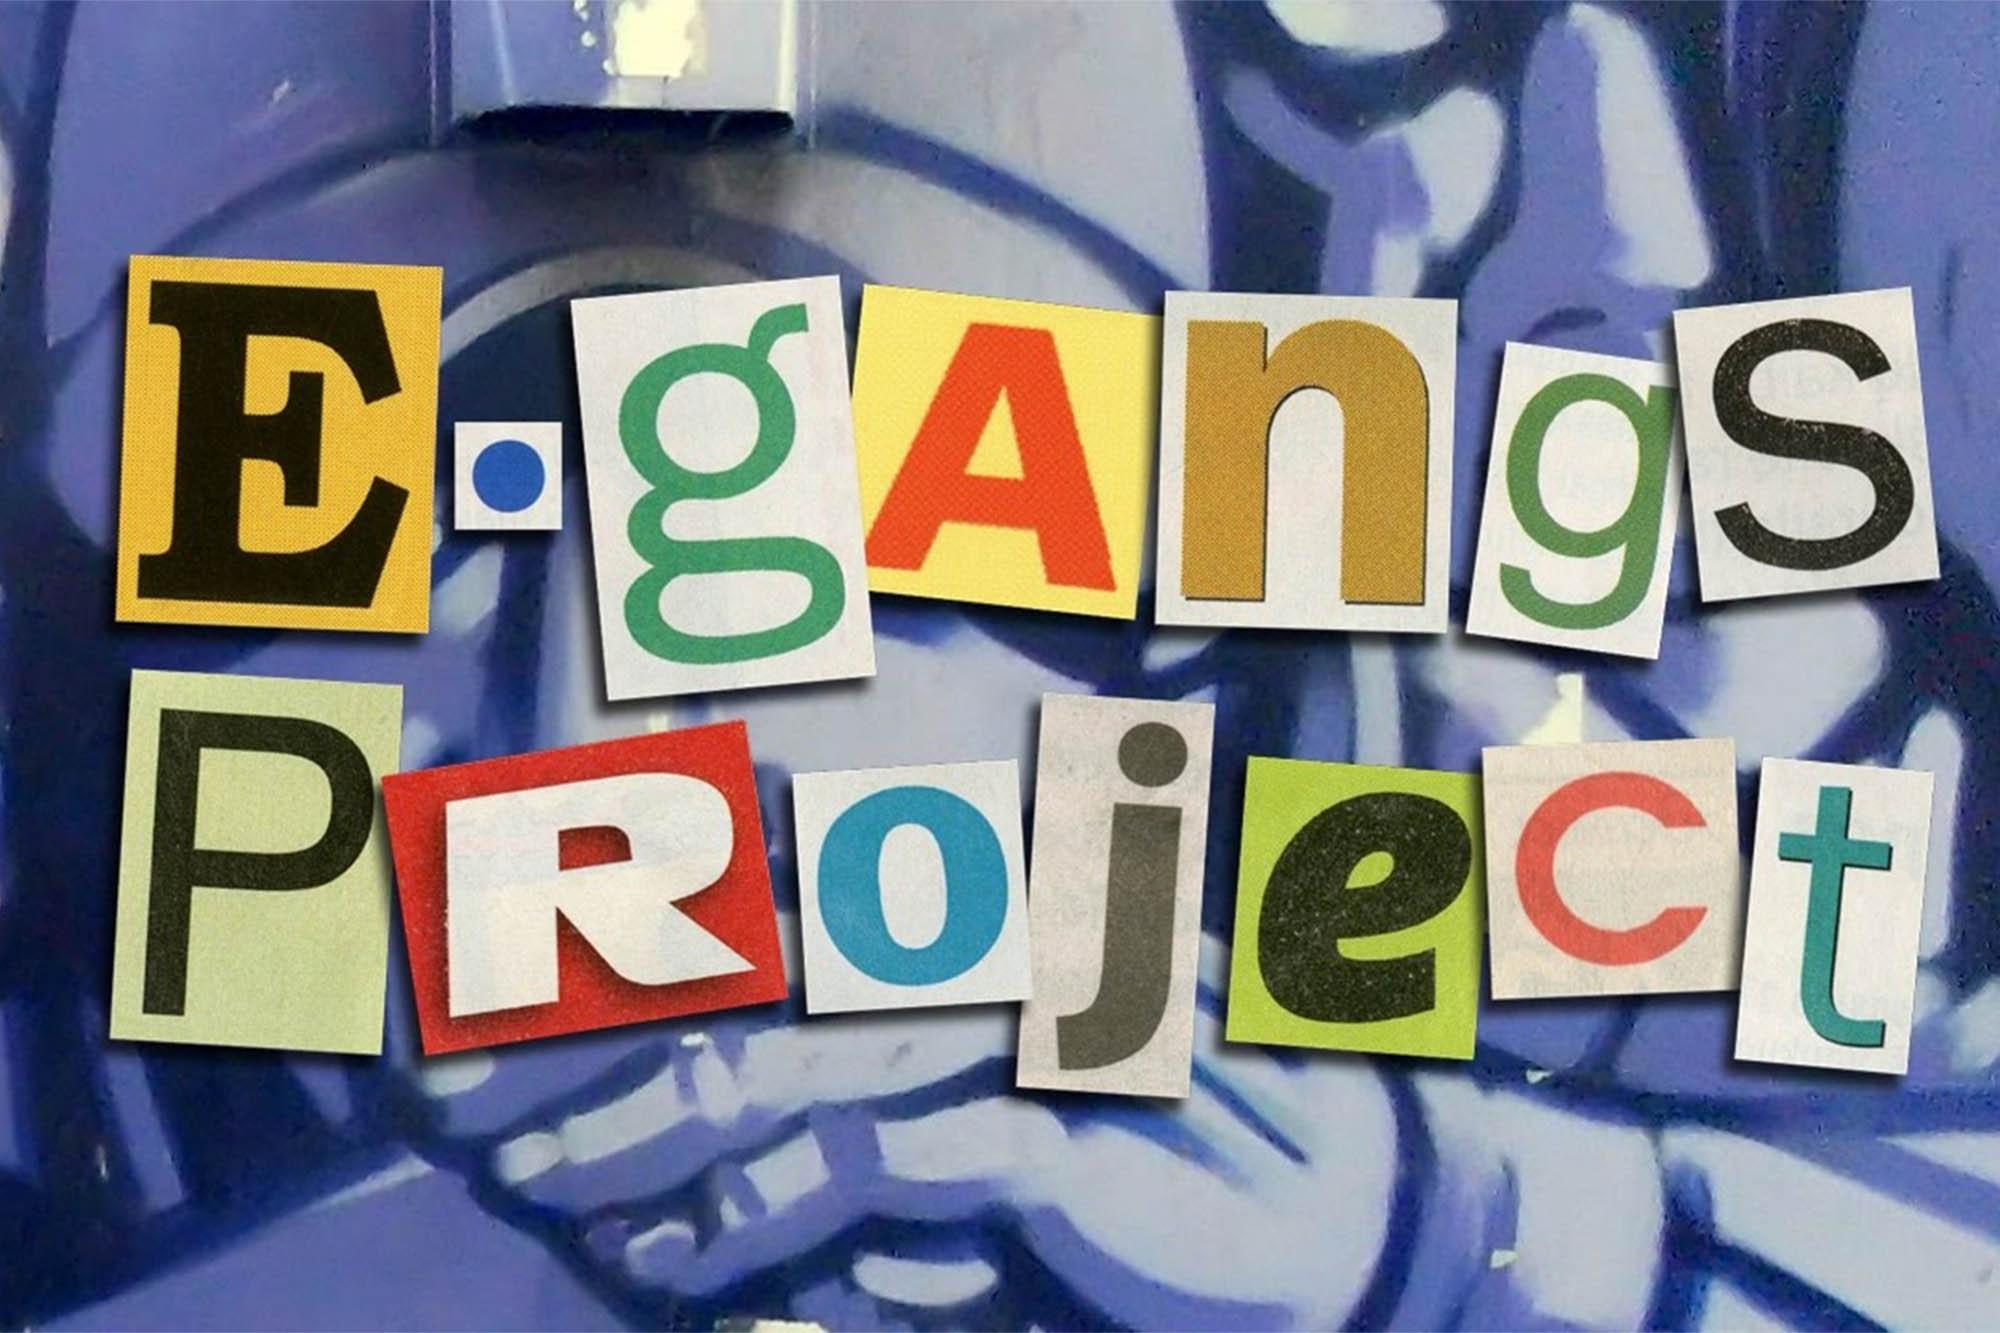 E-Gangs